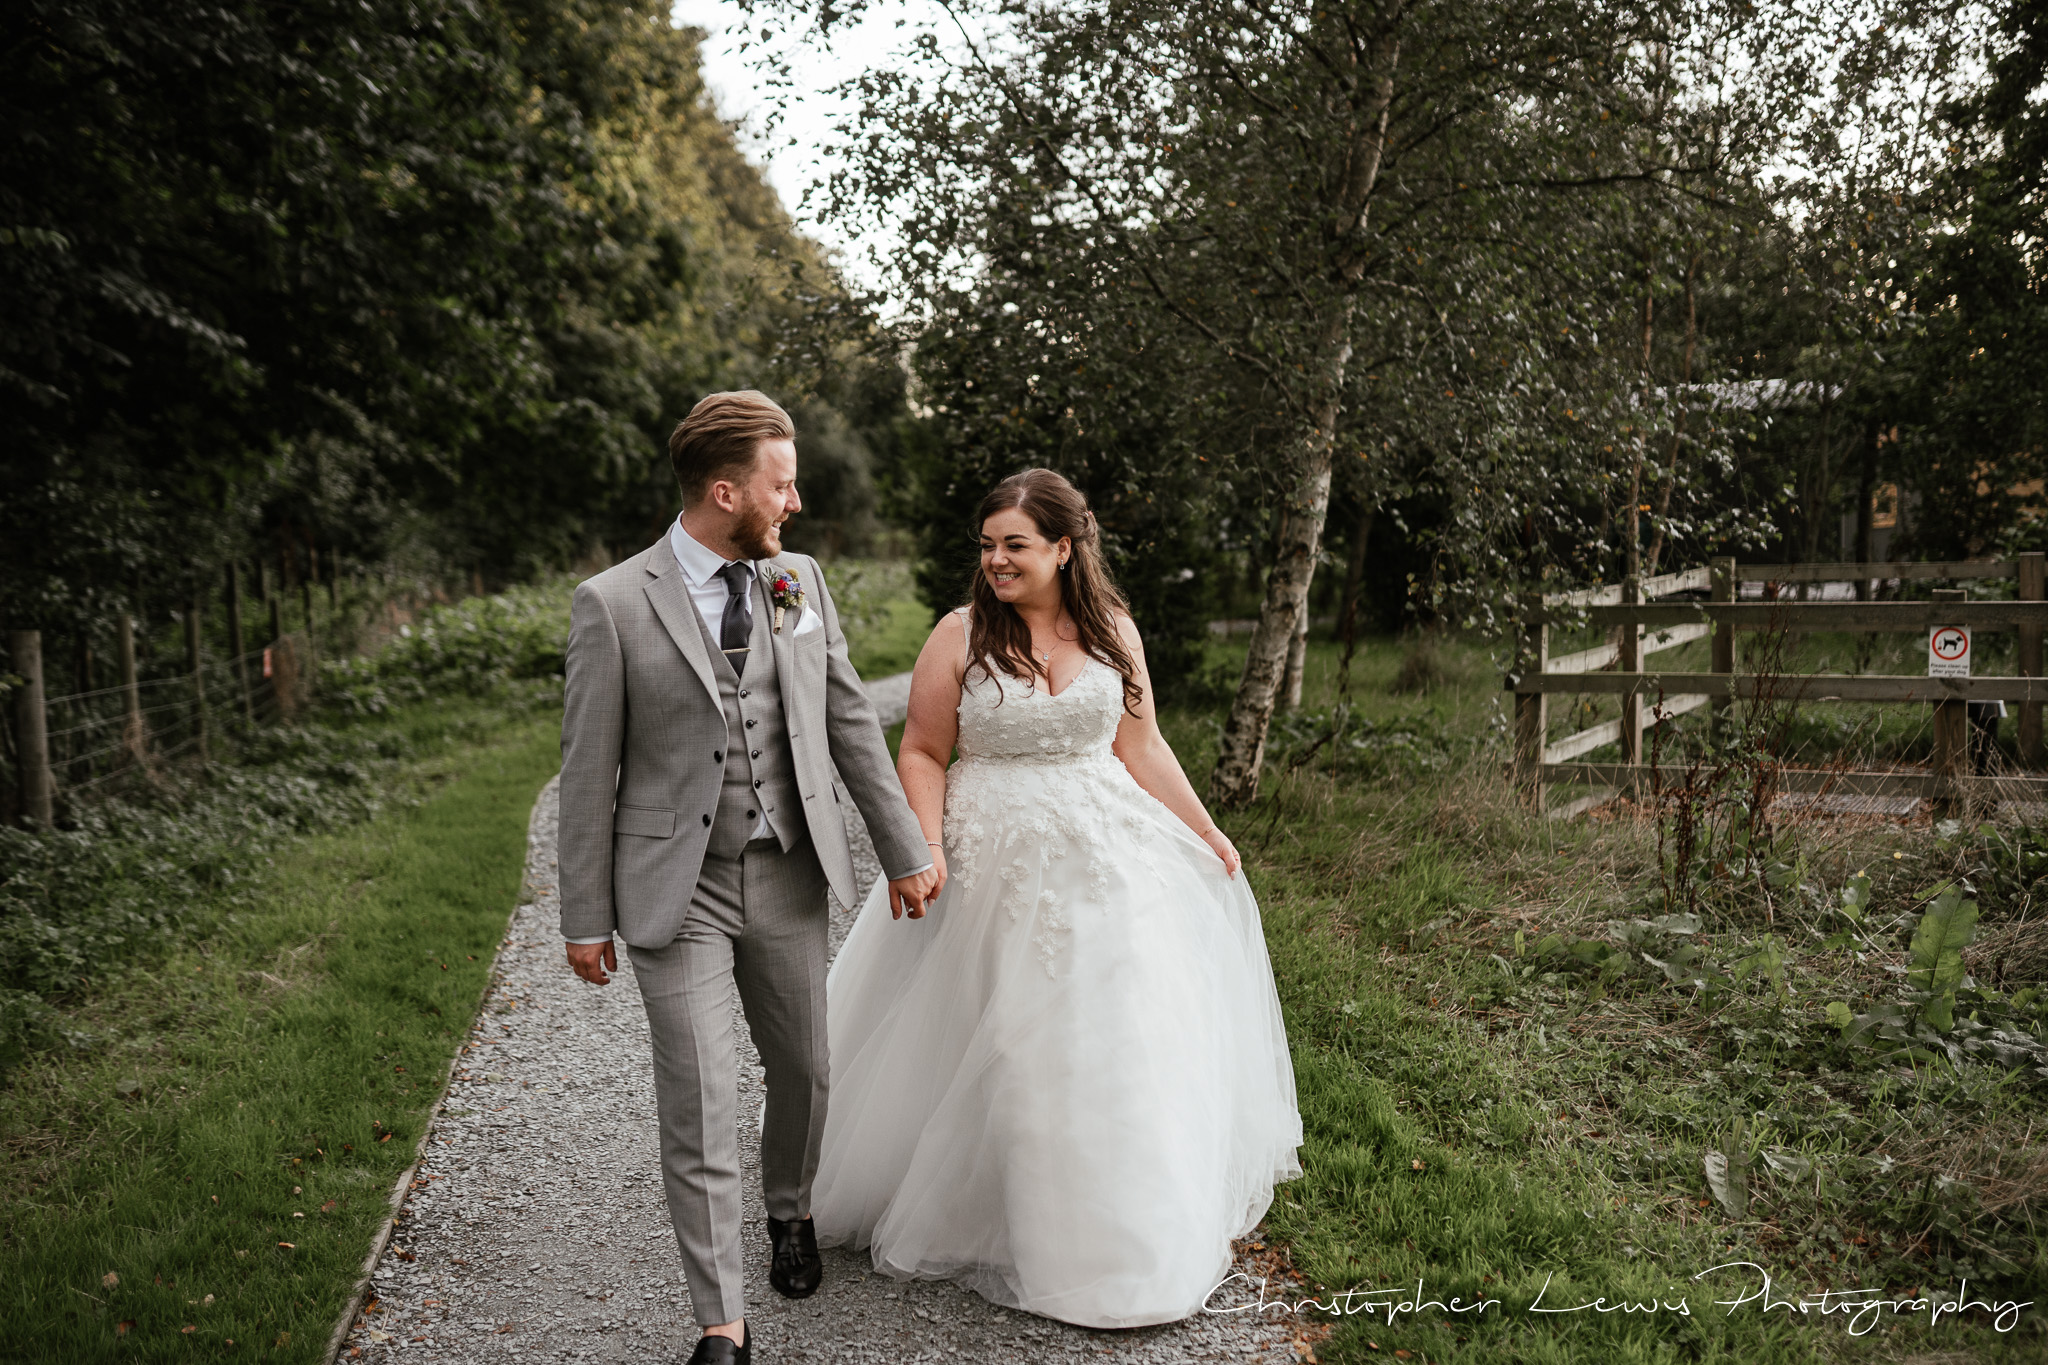 Samlesbury Hall Wedding bride and groom